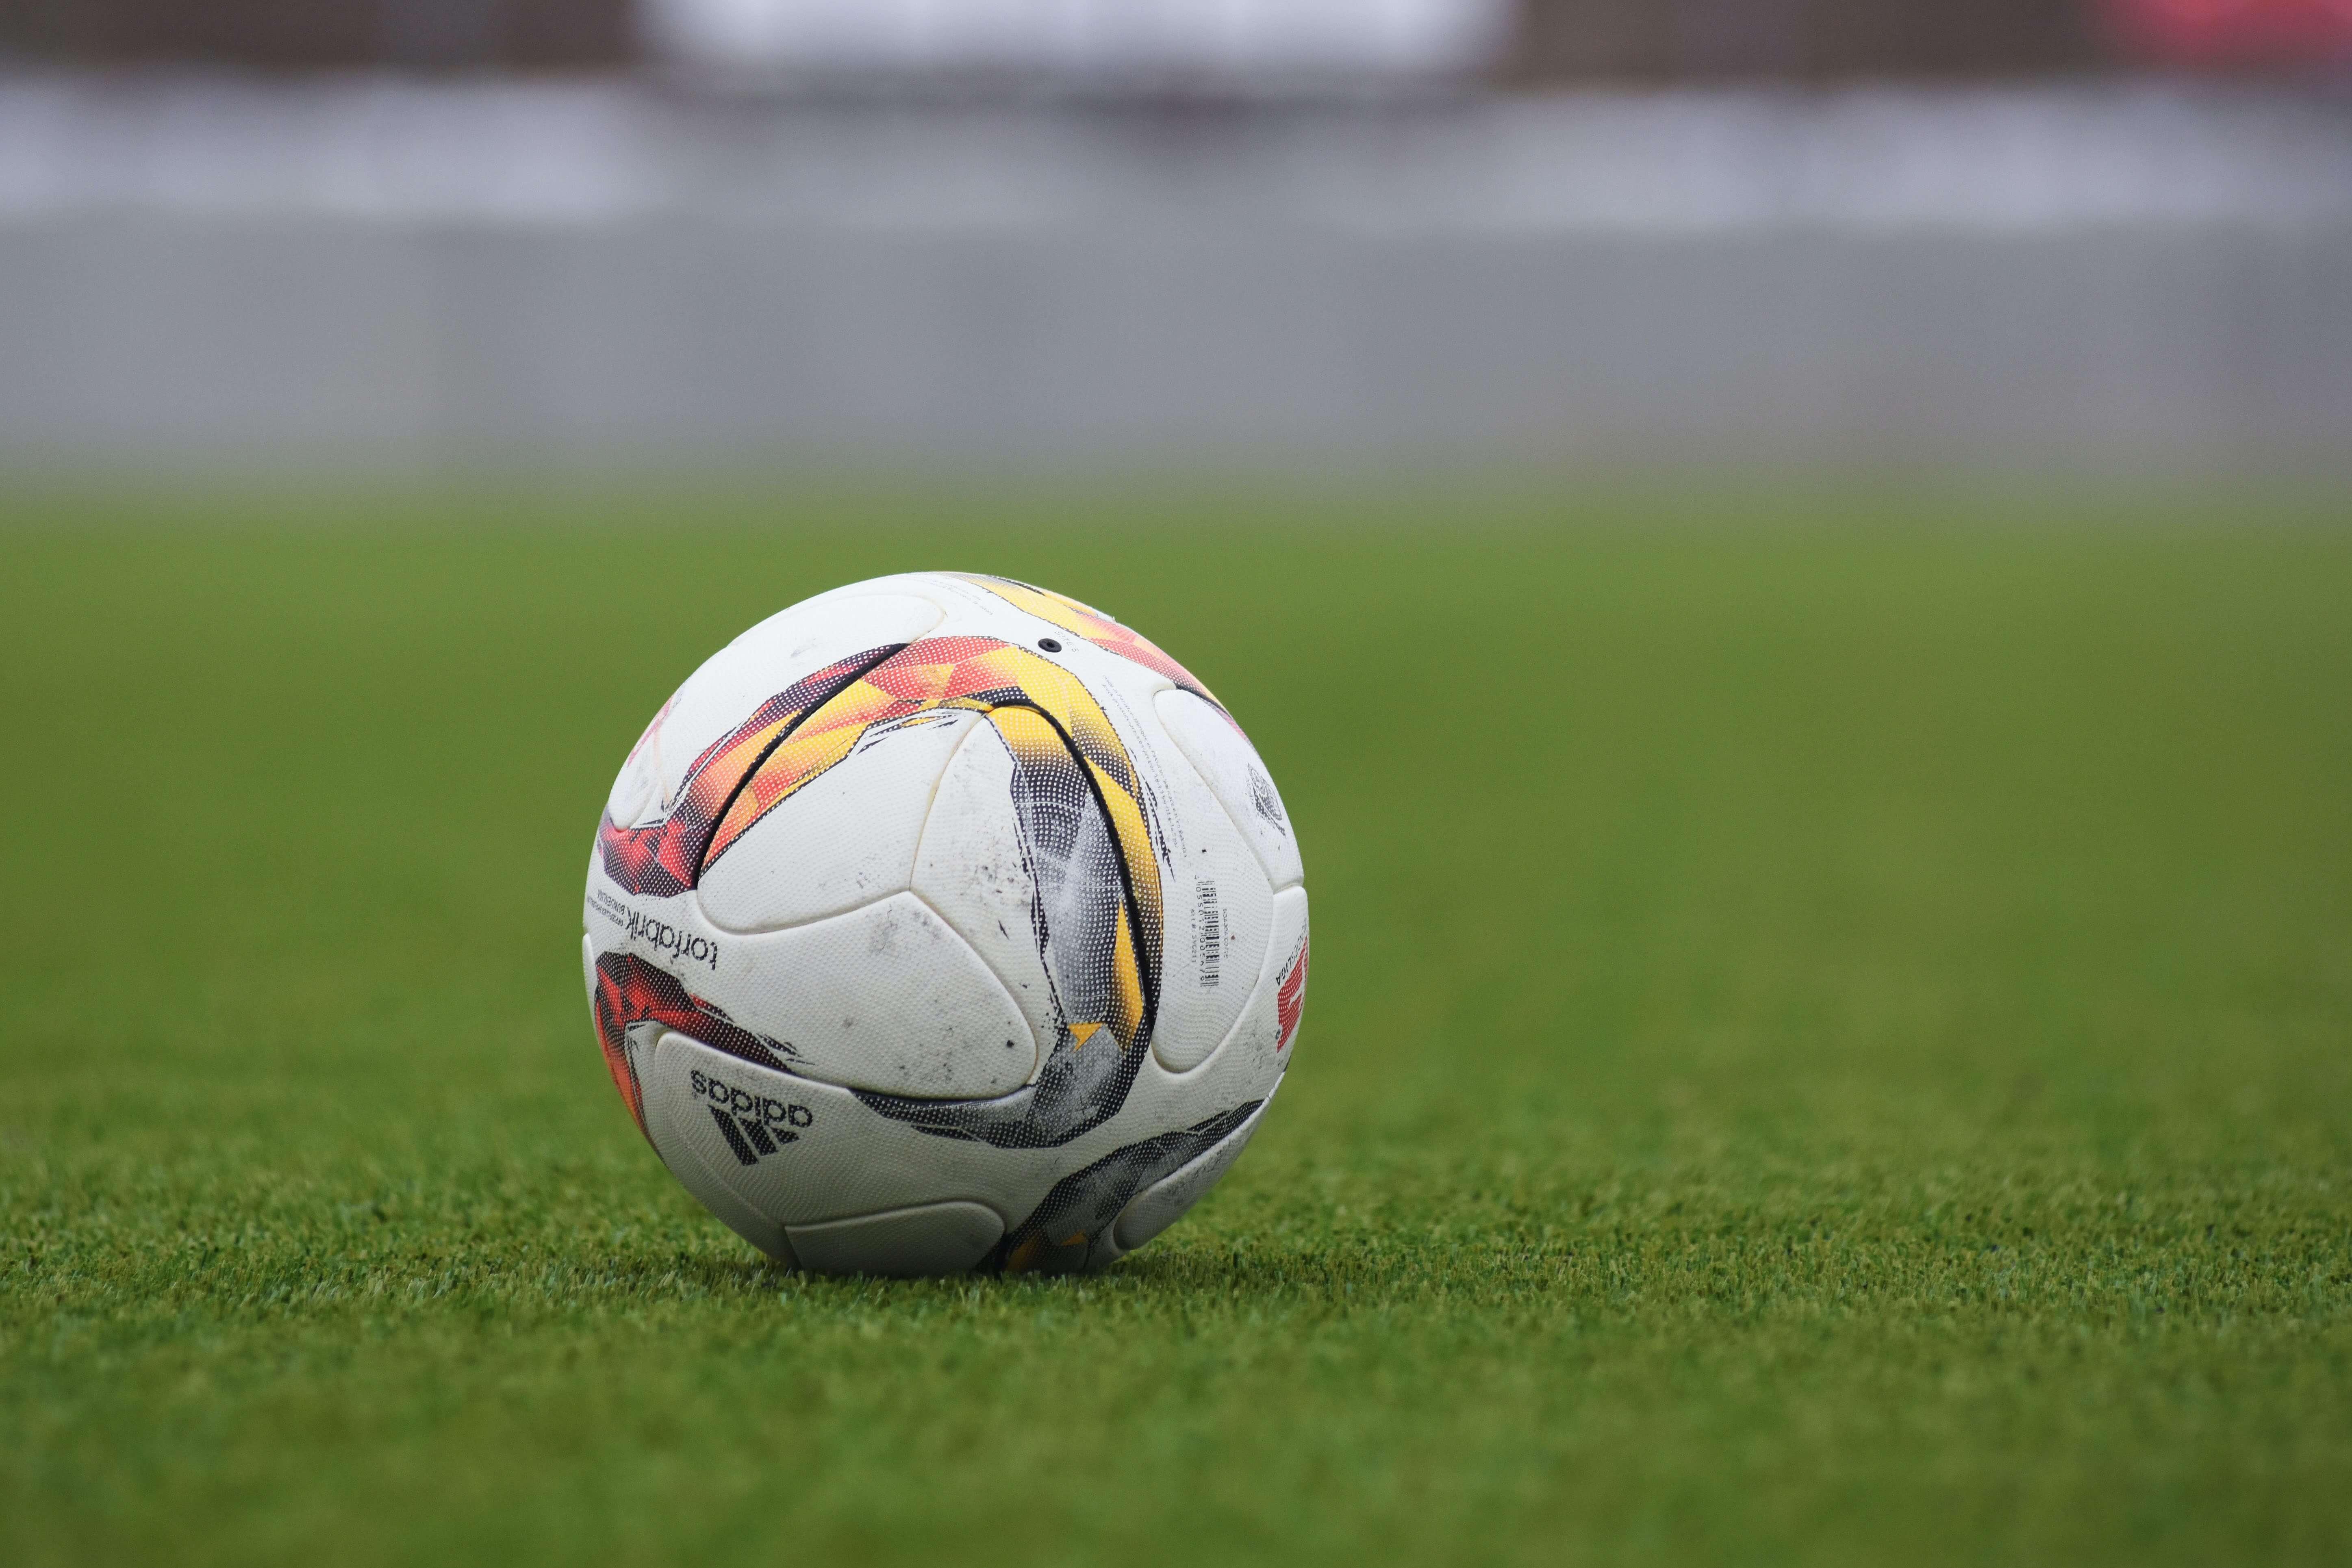 Inter Milan Announces Socios (Chiliz) As New Main Sponsor For 21/22 Season